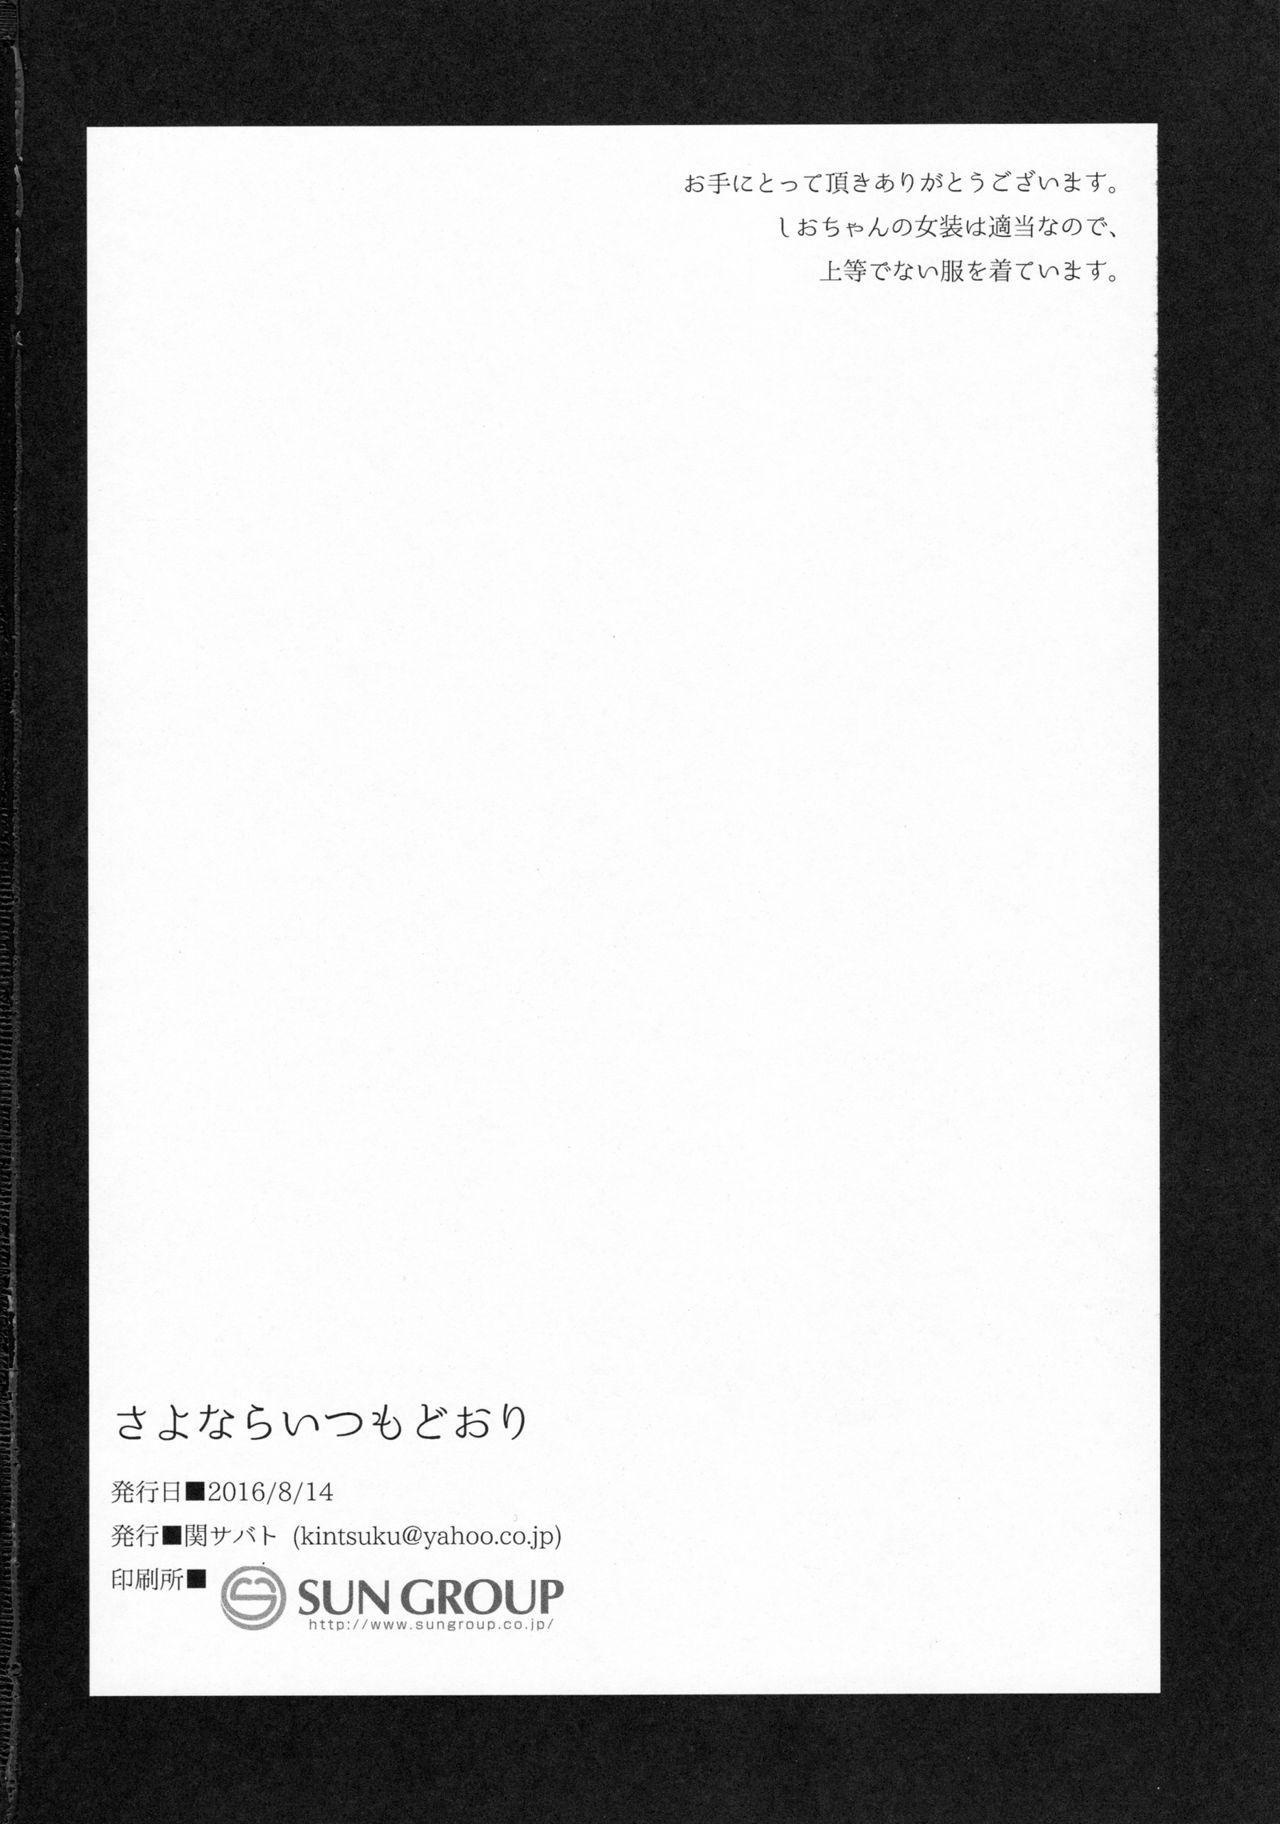 Sayonara Itsumodoori 23